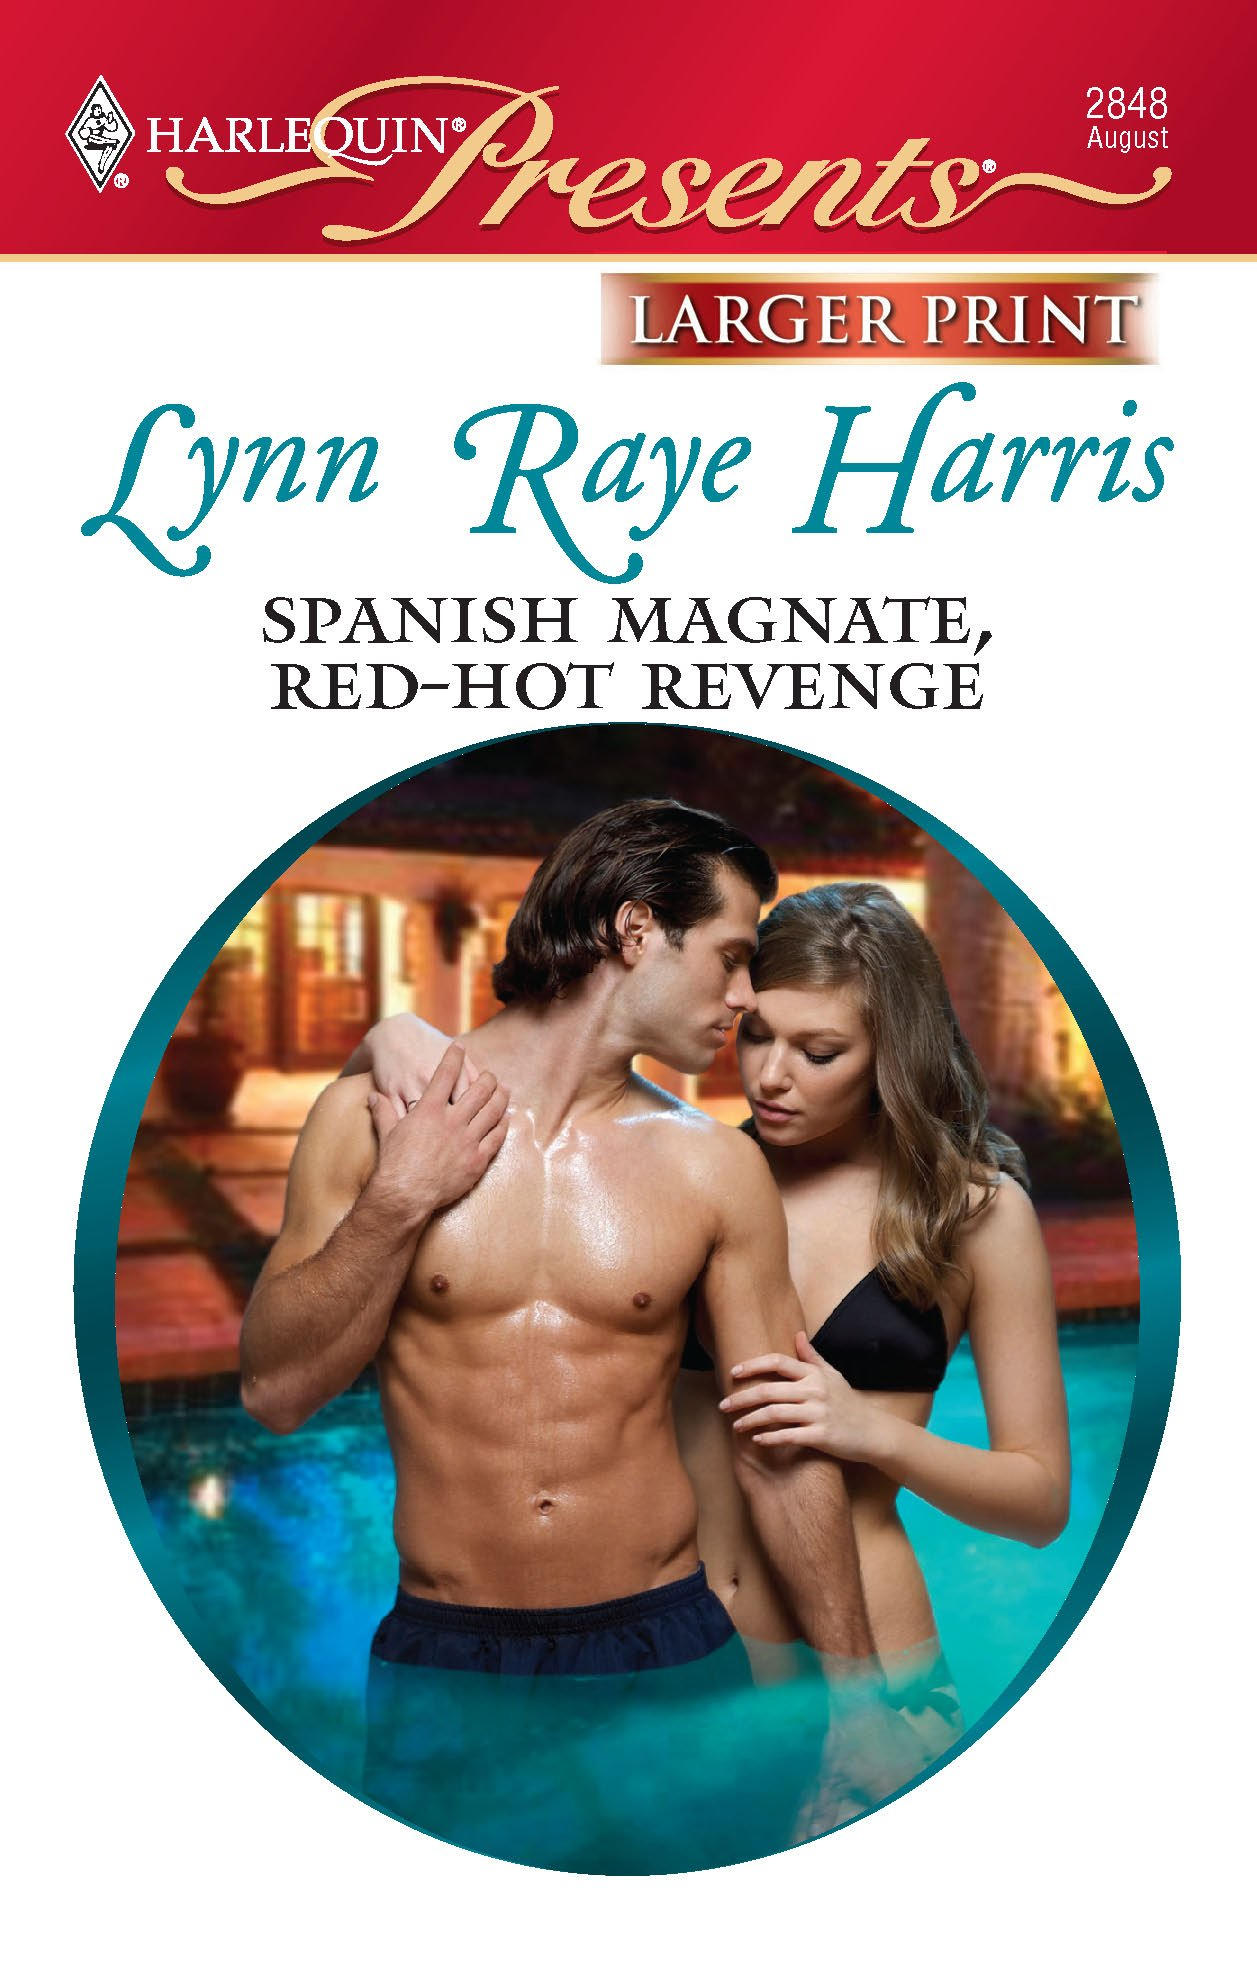 Spanish Magnate, Red-Hot Revenge ebook